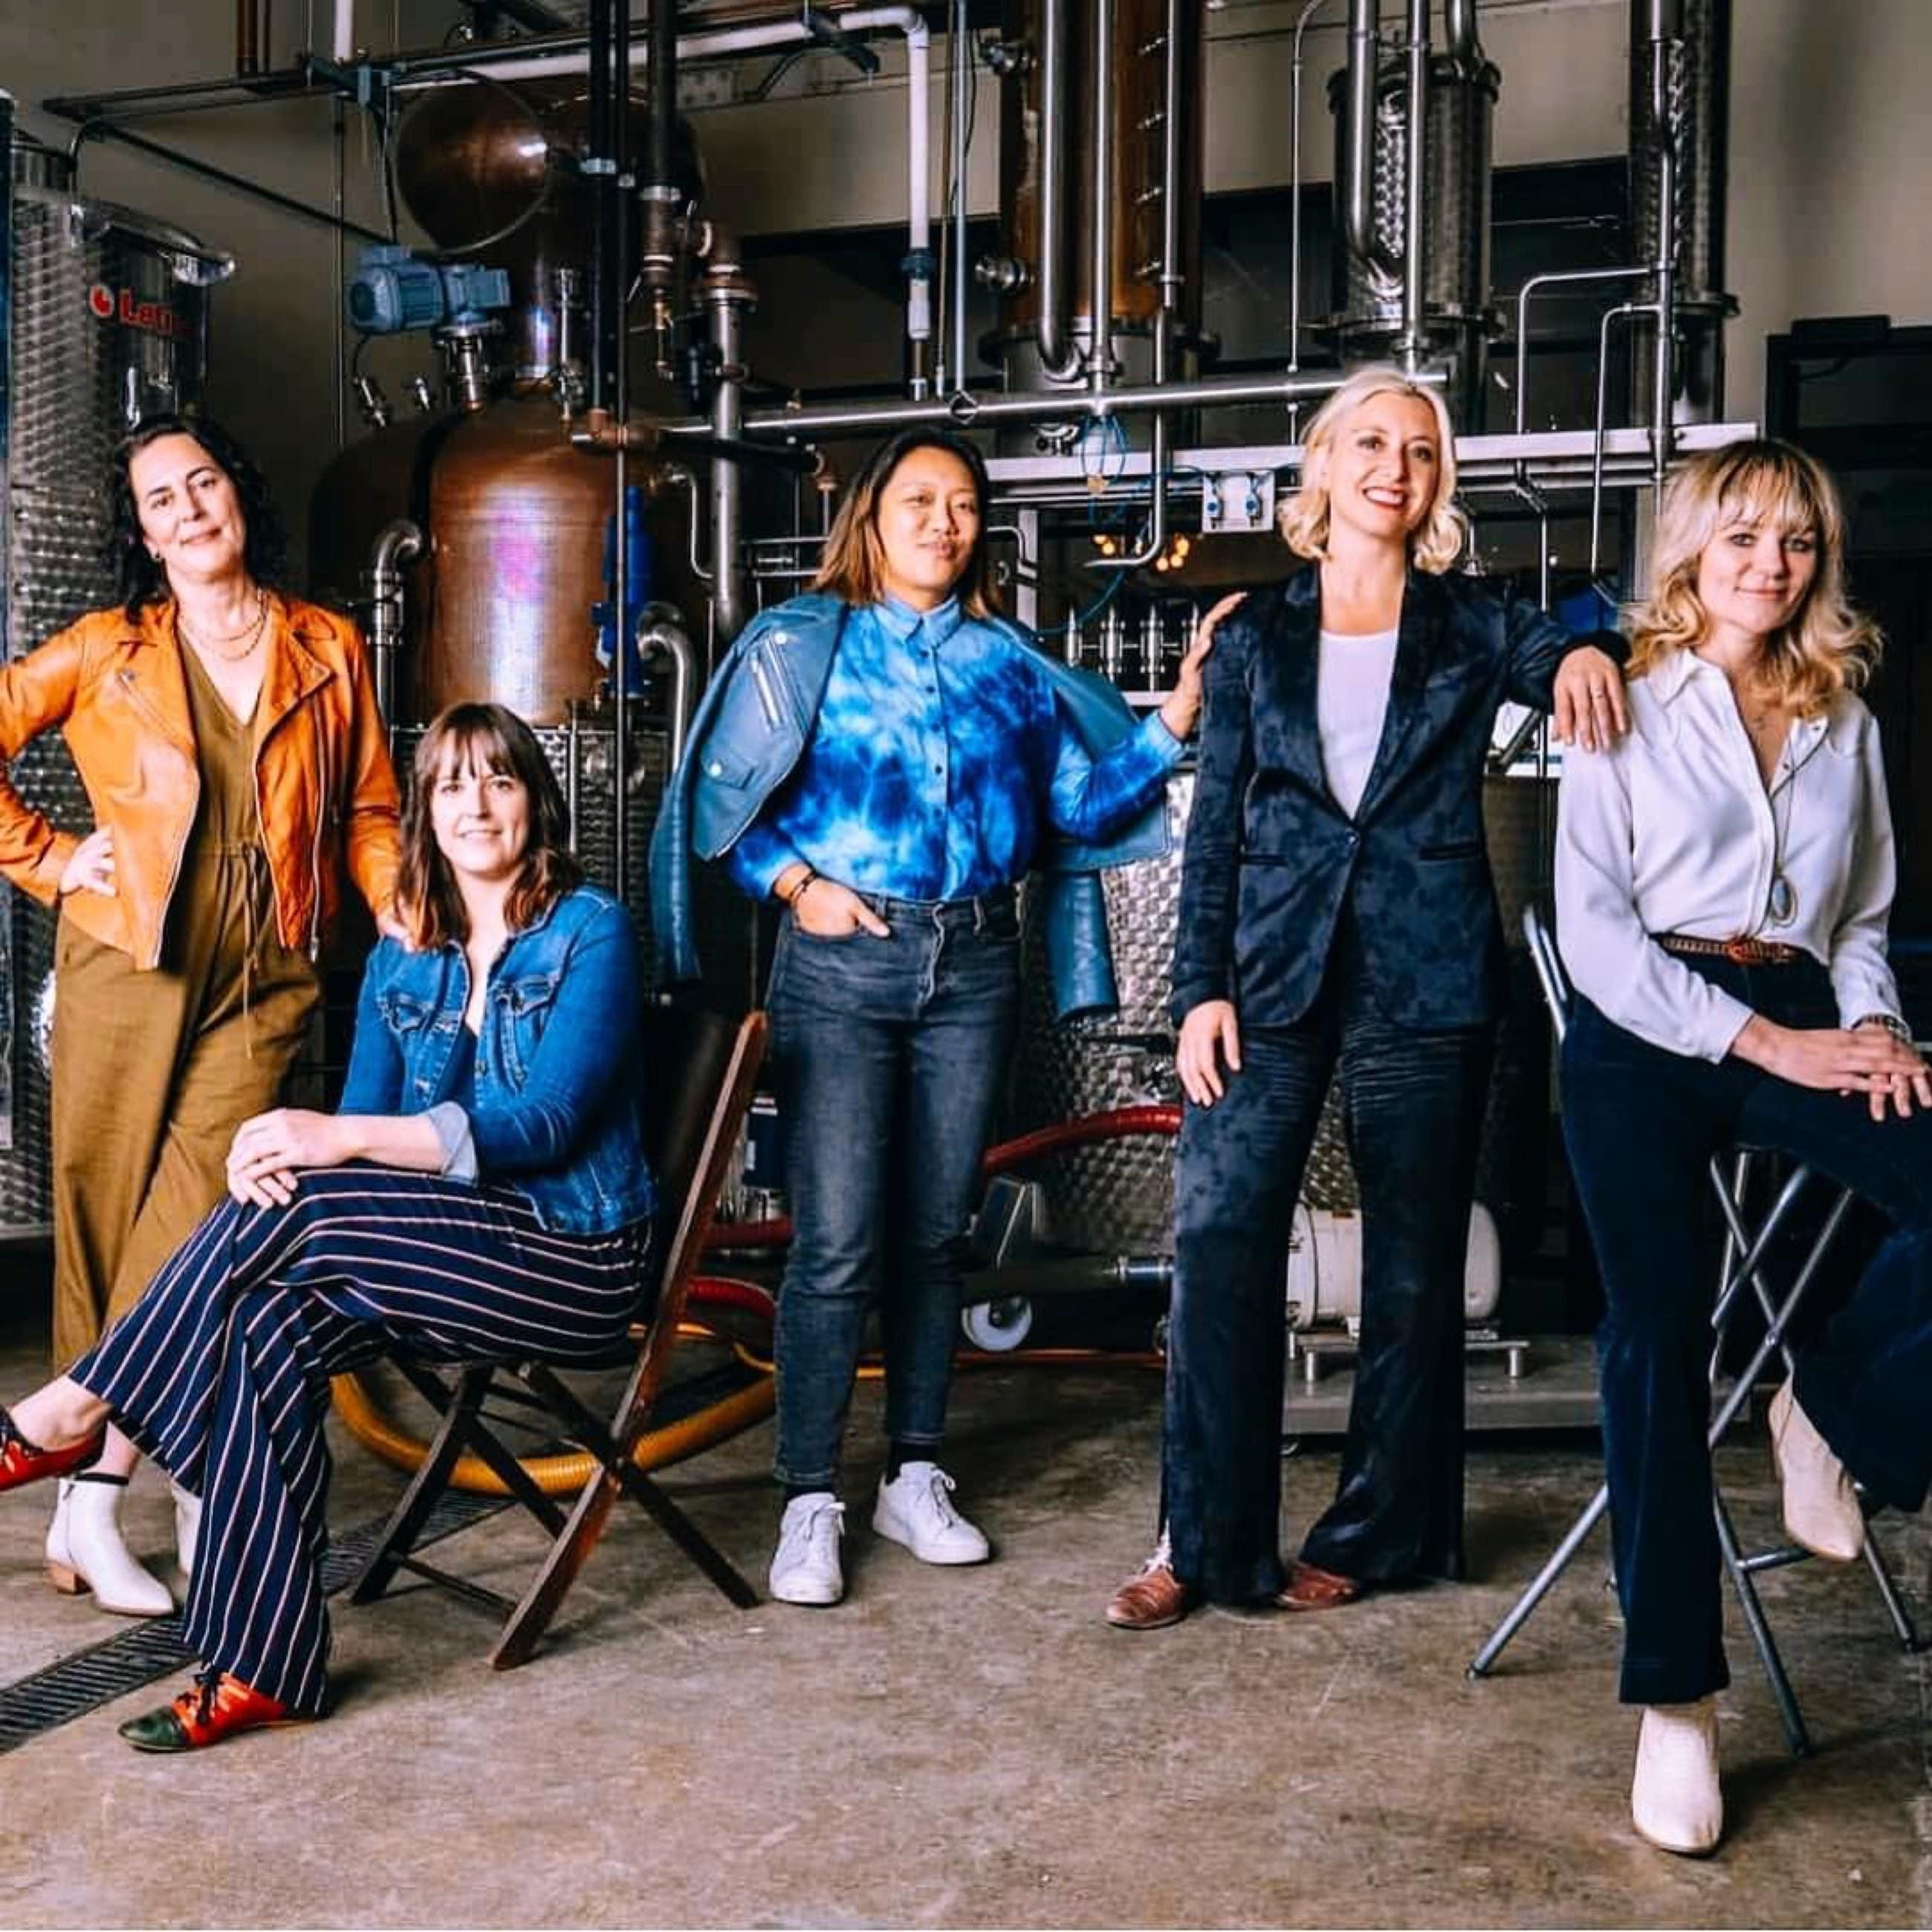 Future Gin founders Amy Atwood, Mary Bartlett, Freya Estreller, Natasha Case and master distiller Morgan McLachlan